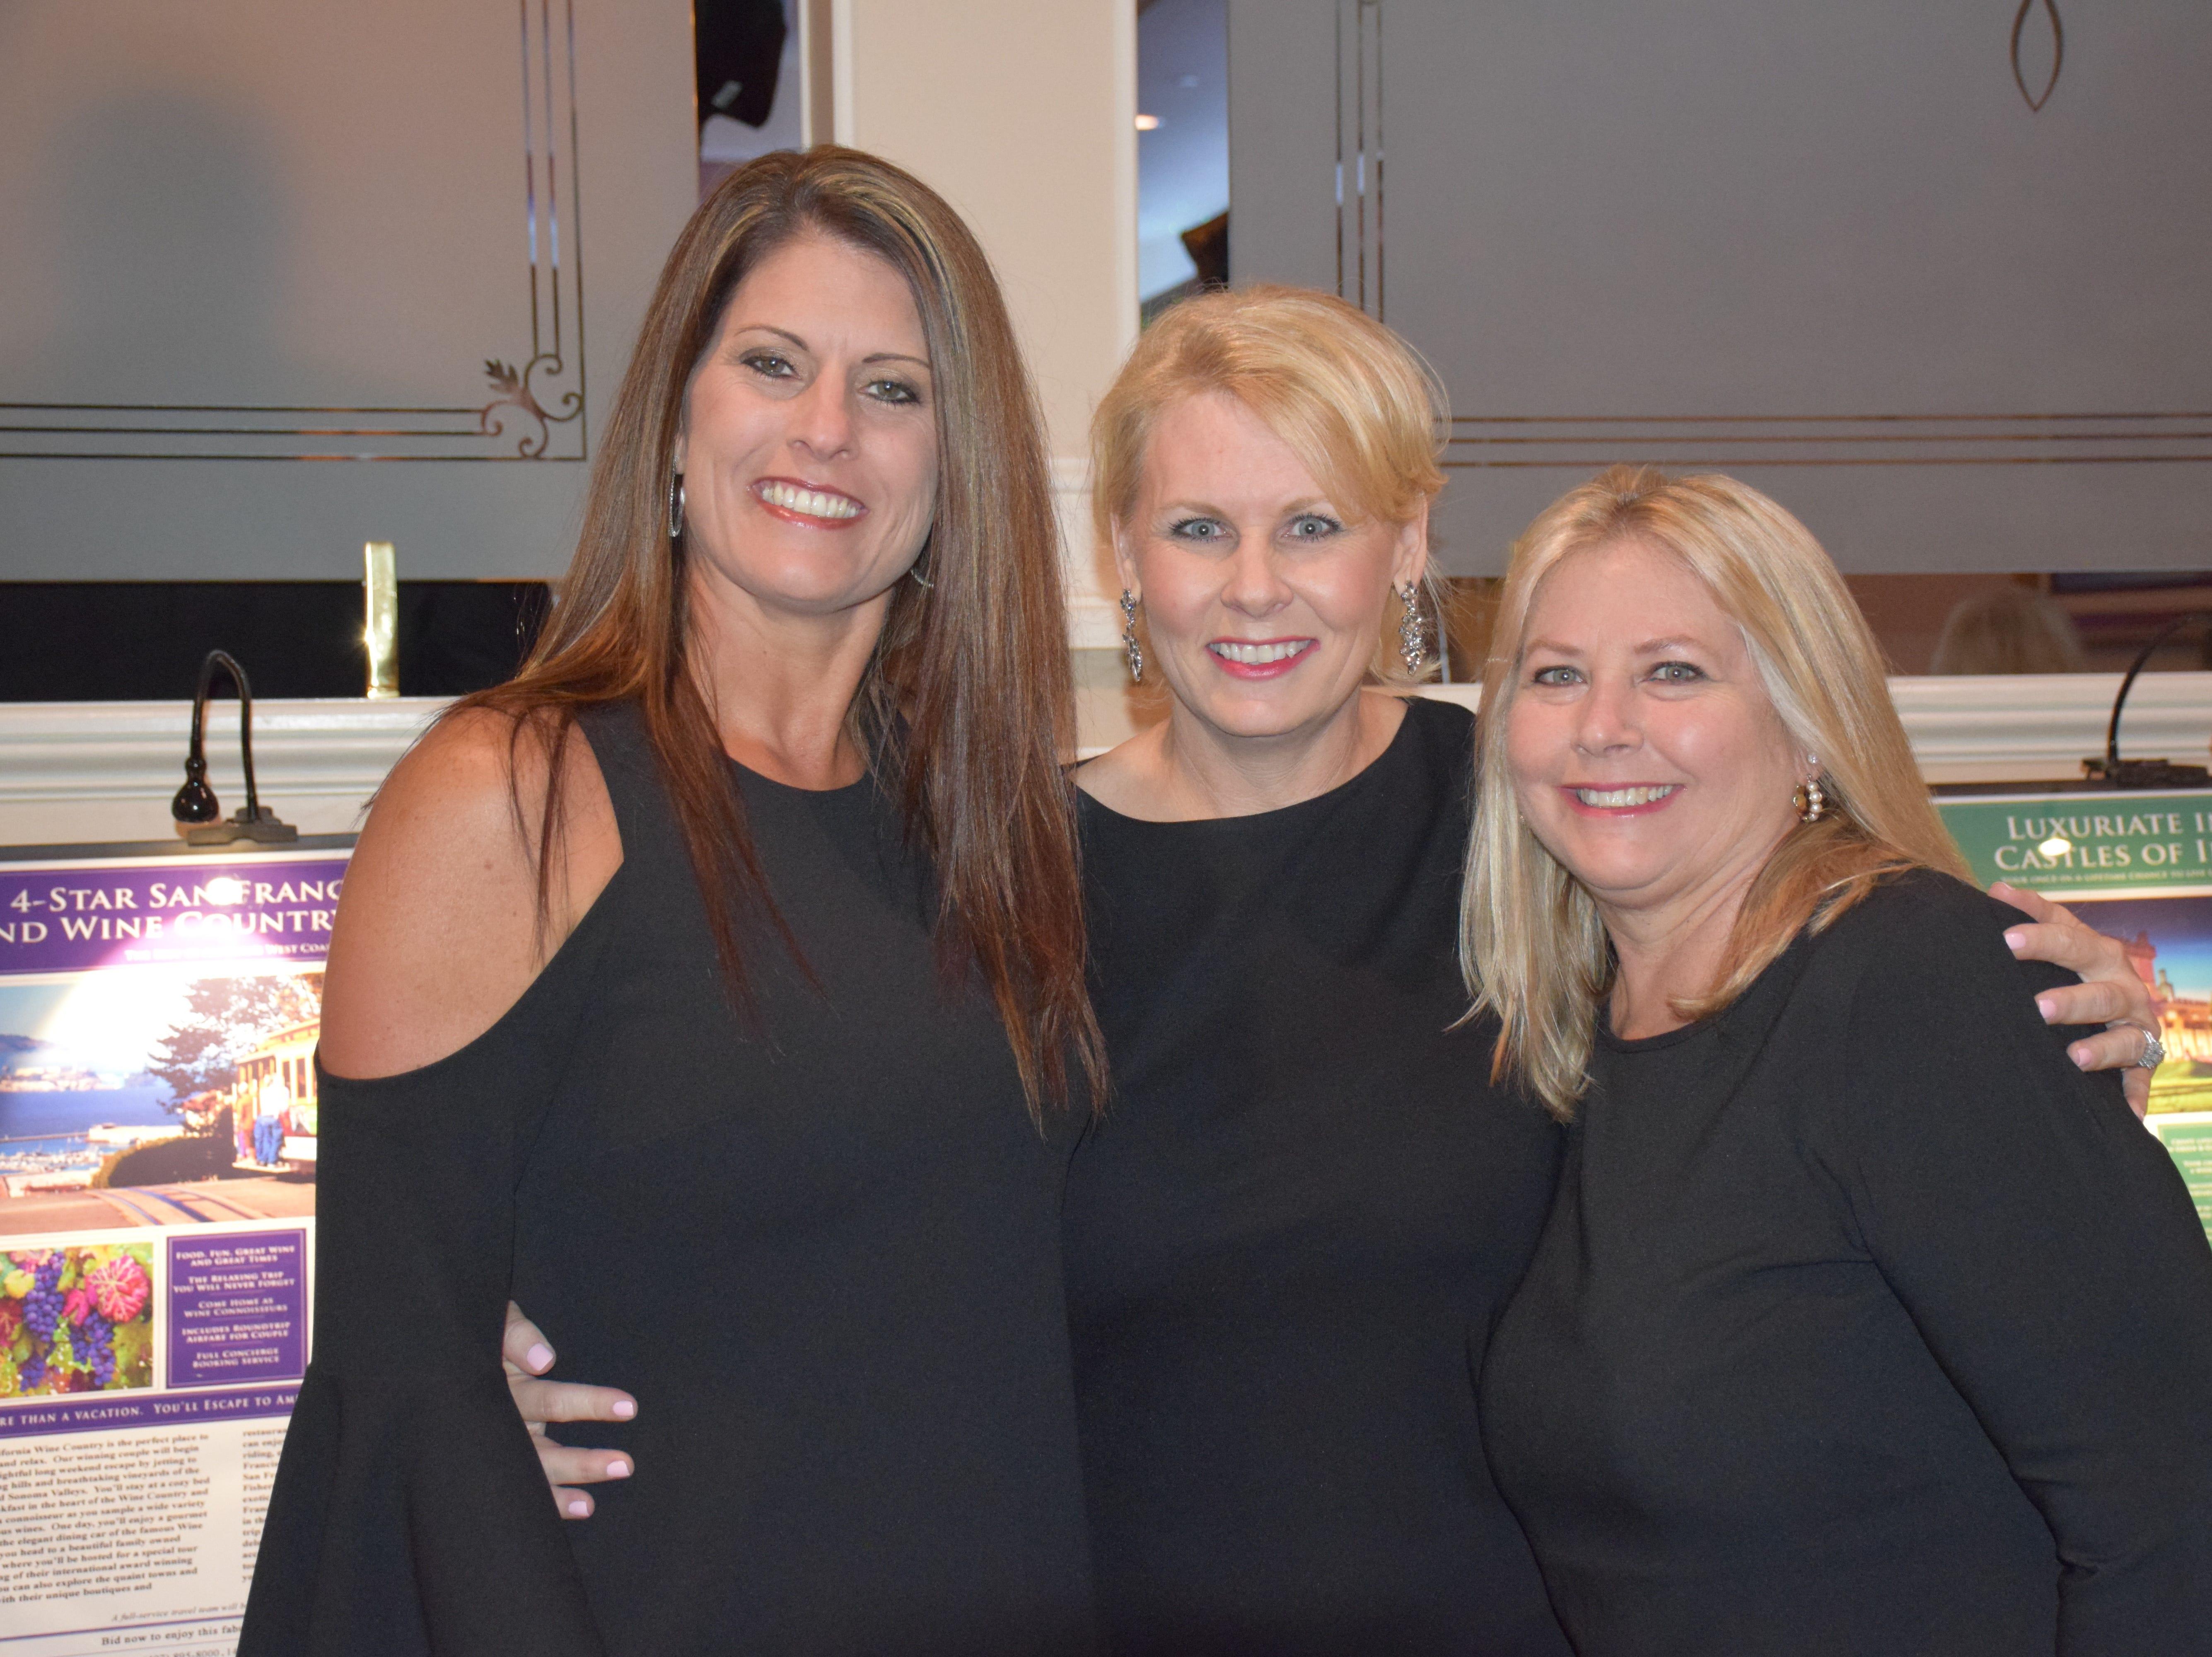 Michelle Griffin, Marni Howder and Rene Cox